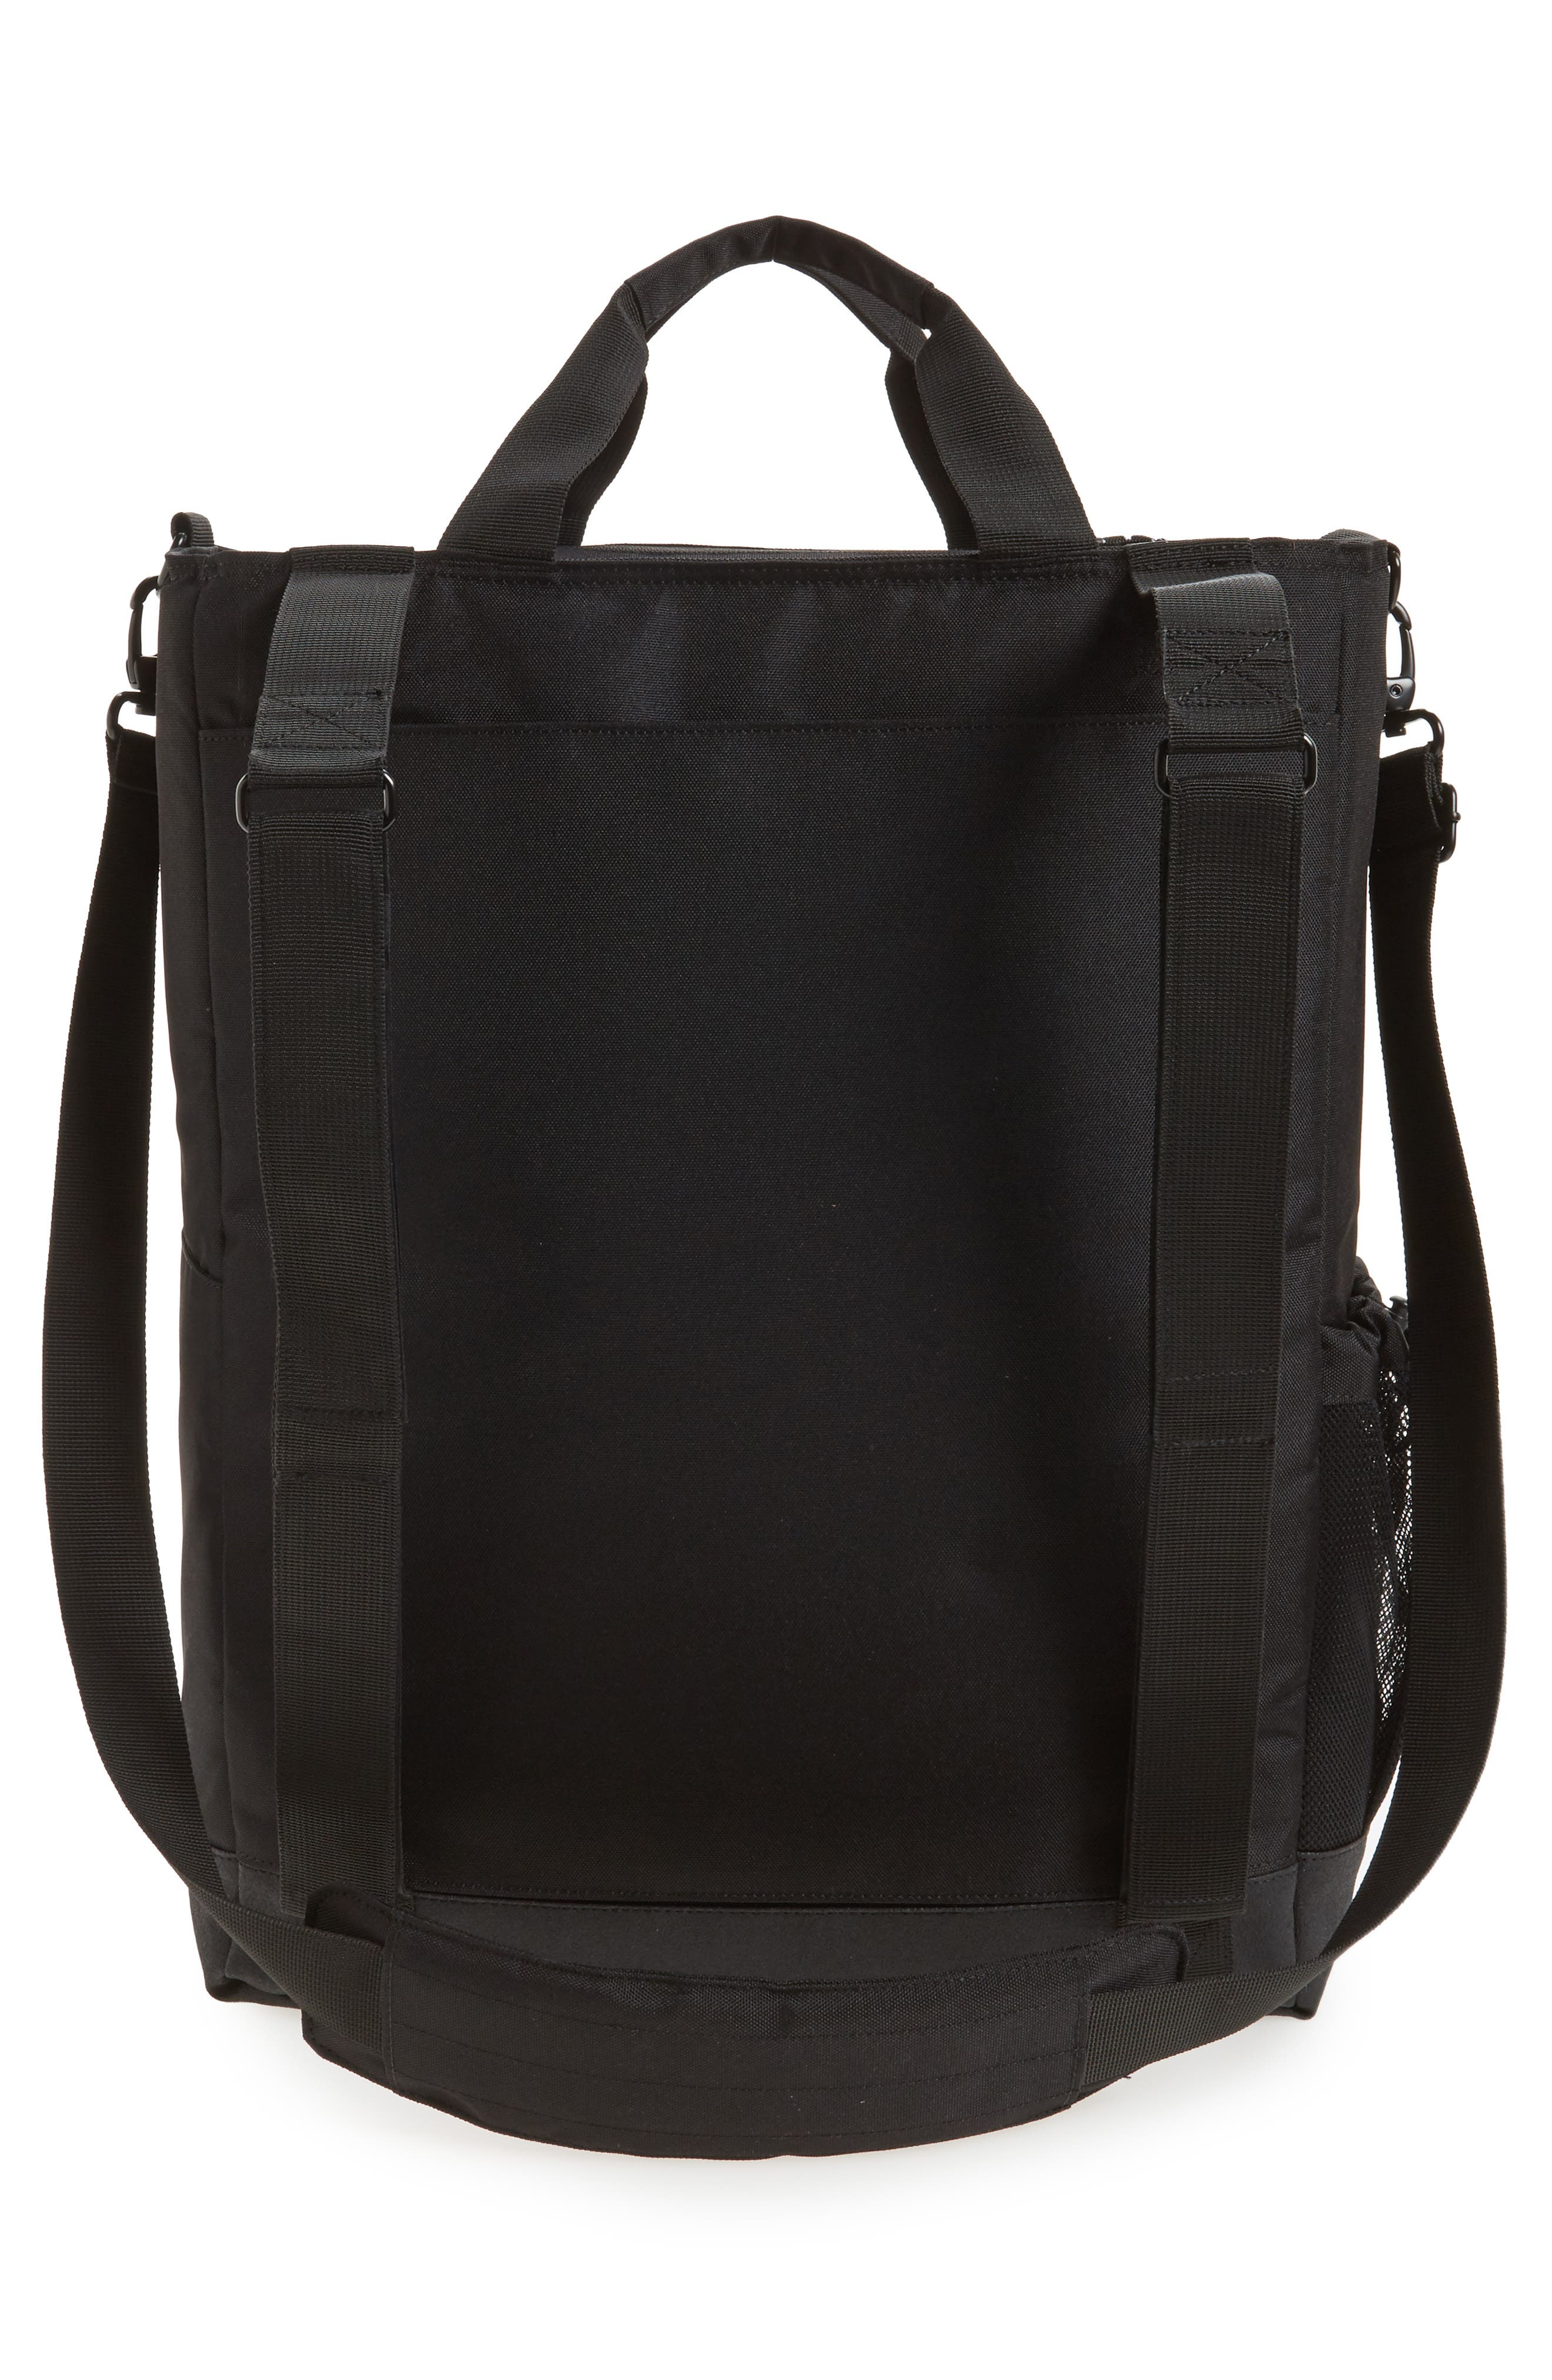 Alternate Image 3  - HEX Surf Tote Bag